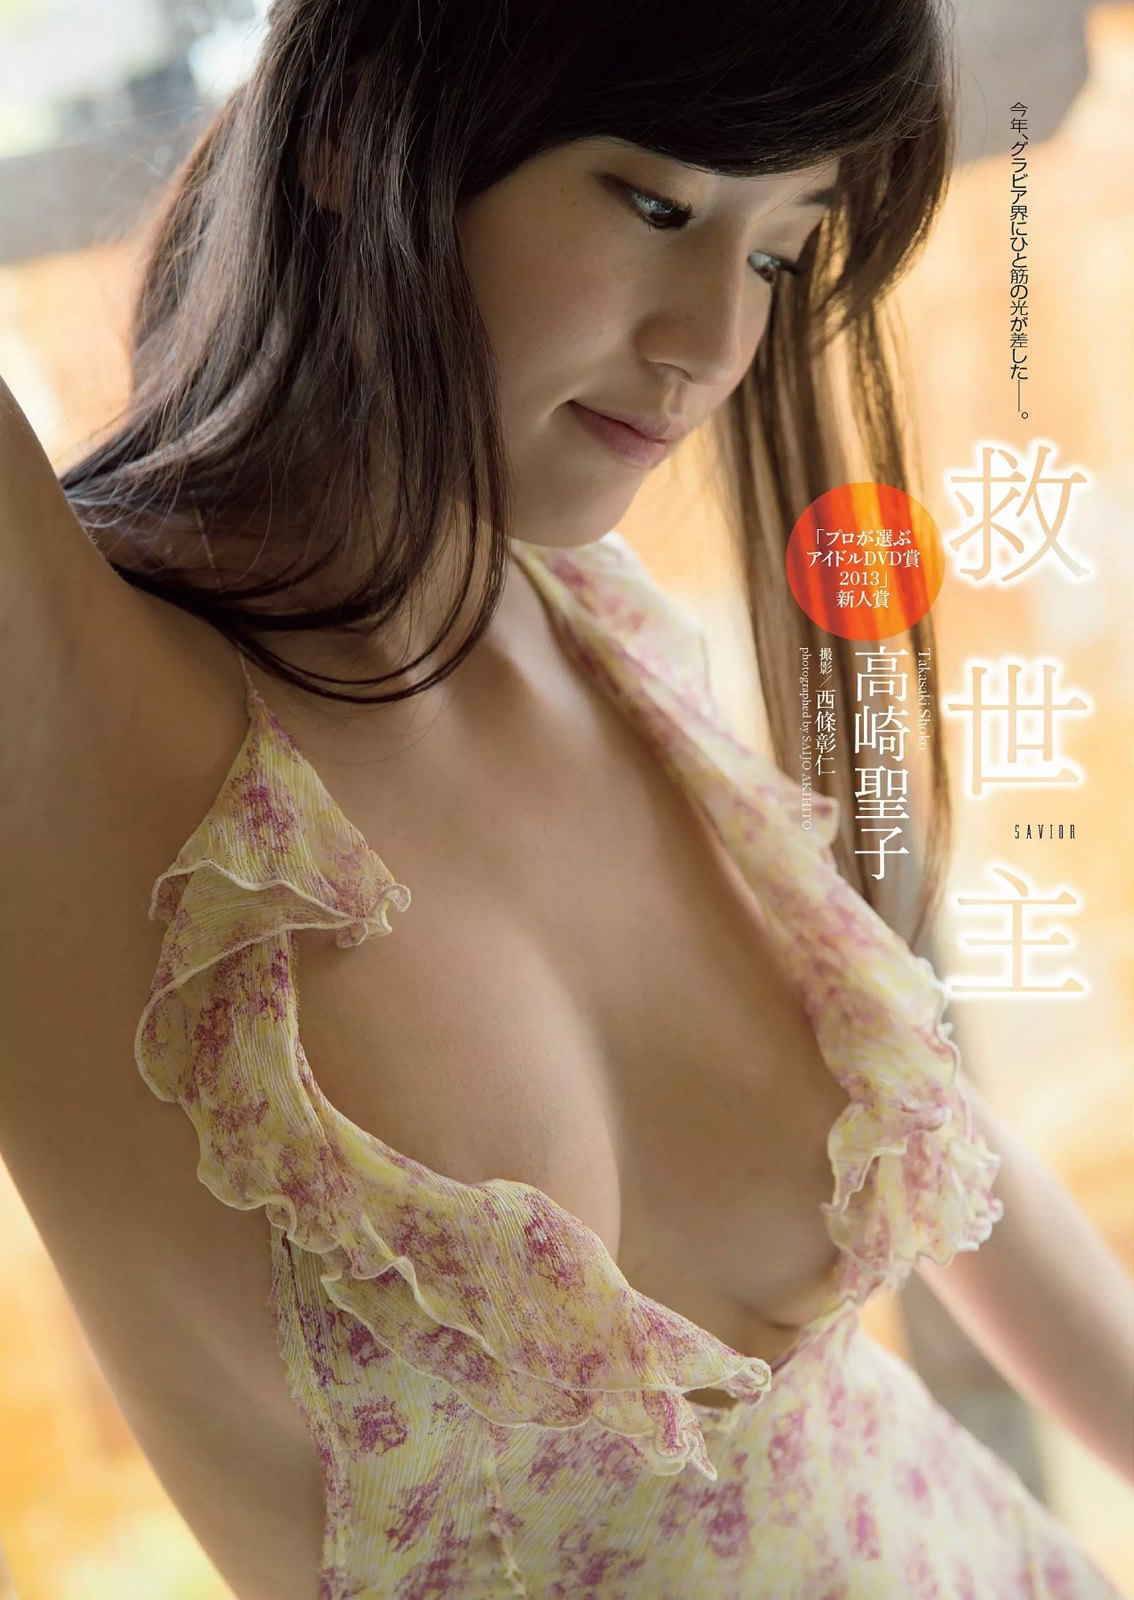 【AVデビュー】高崎聖子 Part.10【MUTEKIから?】 [無断転載禁止]©bbspink.comYouTube動画>3本 ->画像>153枚